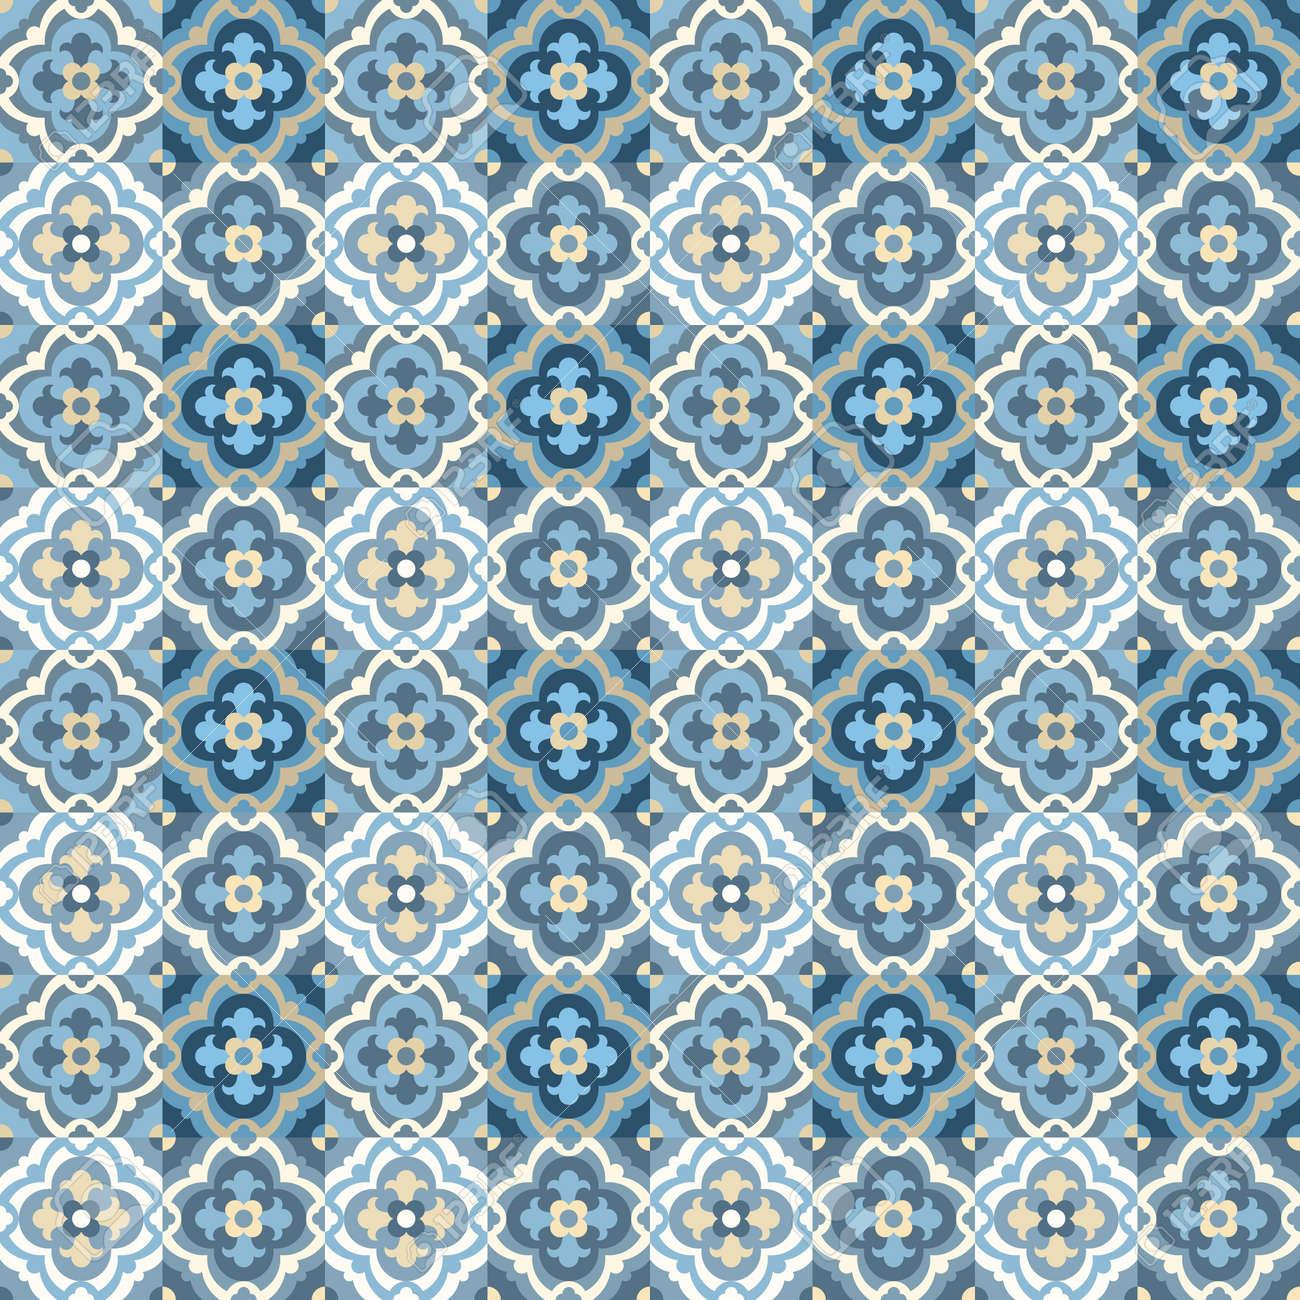 Floor Tiles - Seamless Vintage Pattern With Quatrefoils. Patchwork ...